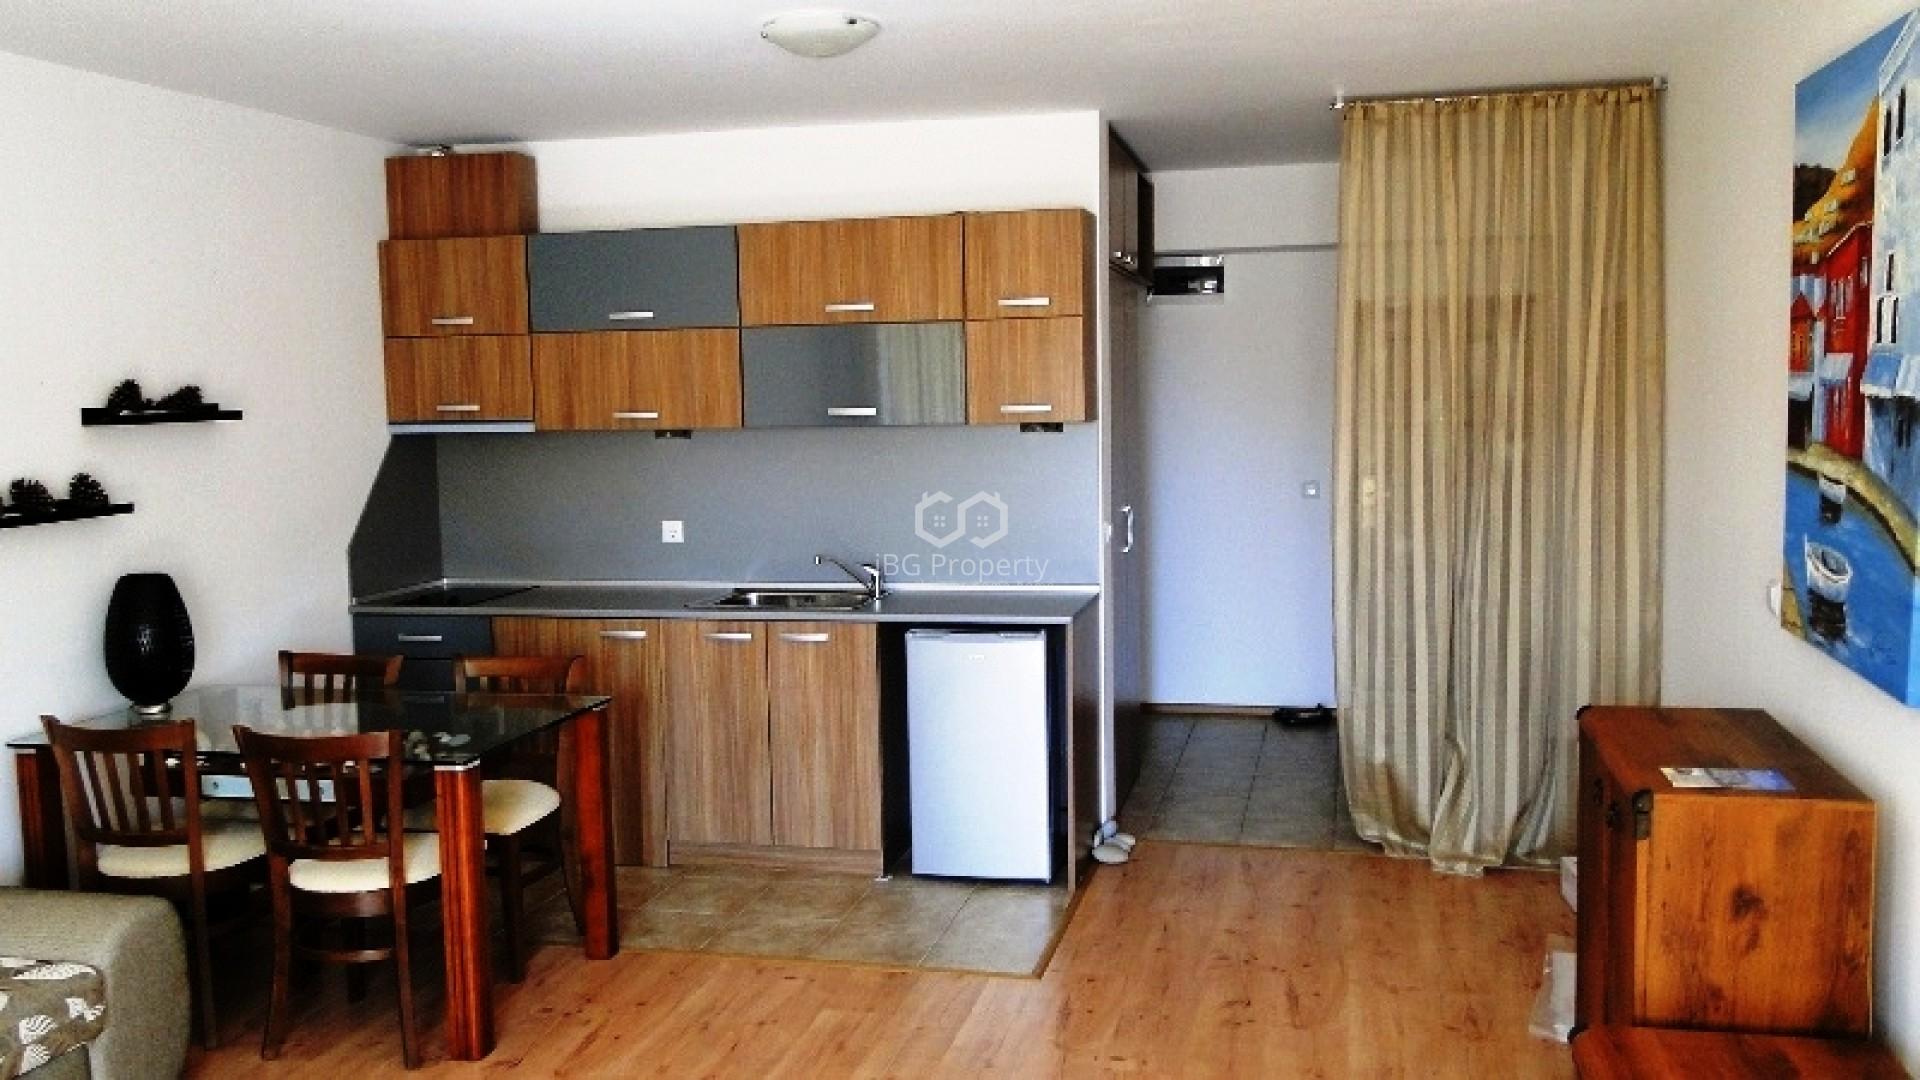 Однокомнатная квартира Бяла  50 m2